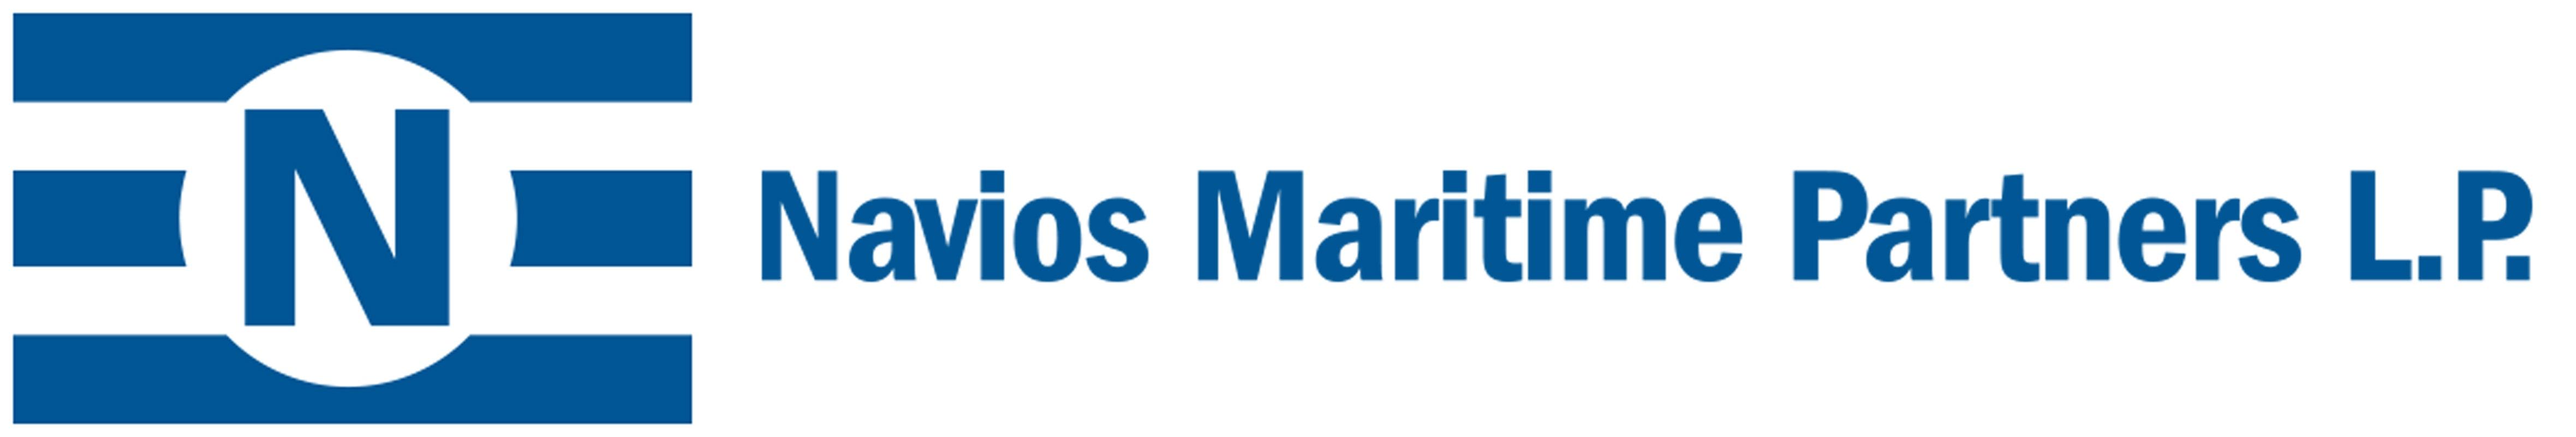 Navios Maritime Partners